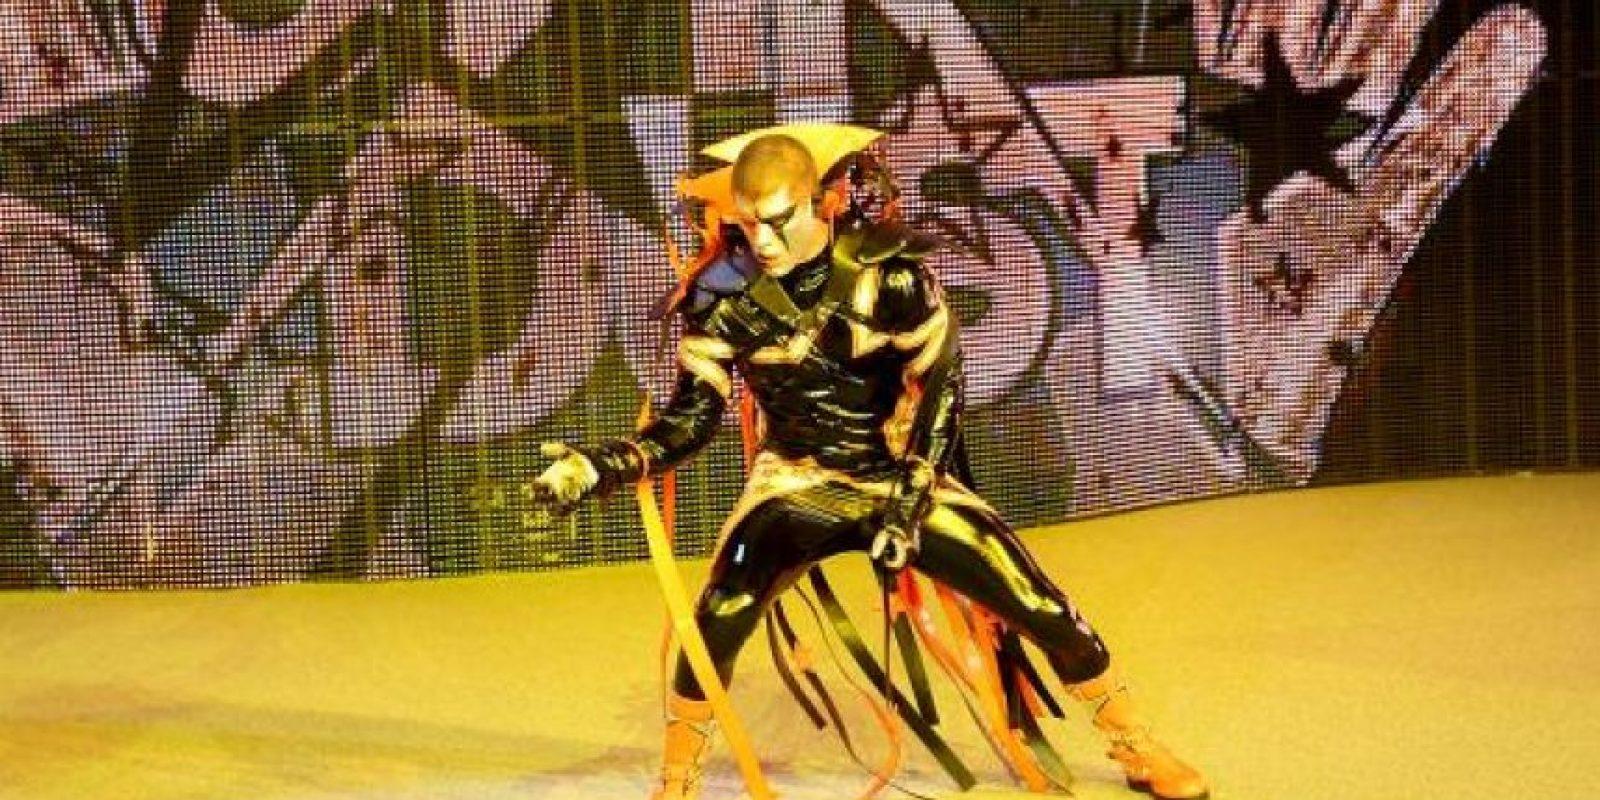 Derrotó a Stardust en la primera pelea de la cartelera Foto:WWE